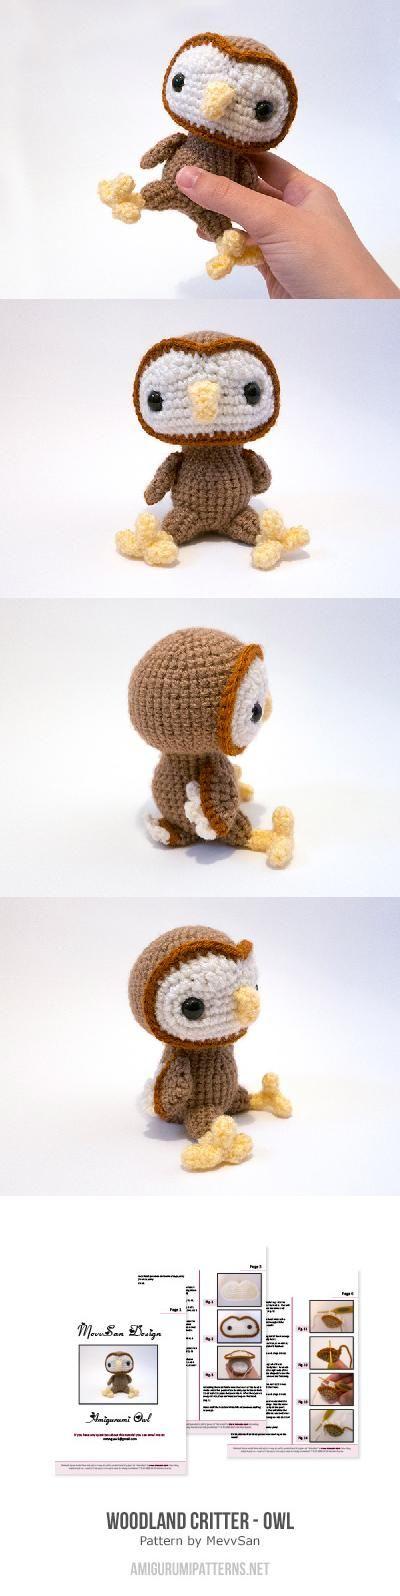 Woodland Critter - owl amigurumi pattern by MevvSan | Ave, Tejido y ...